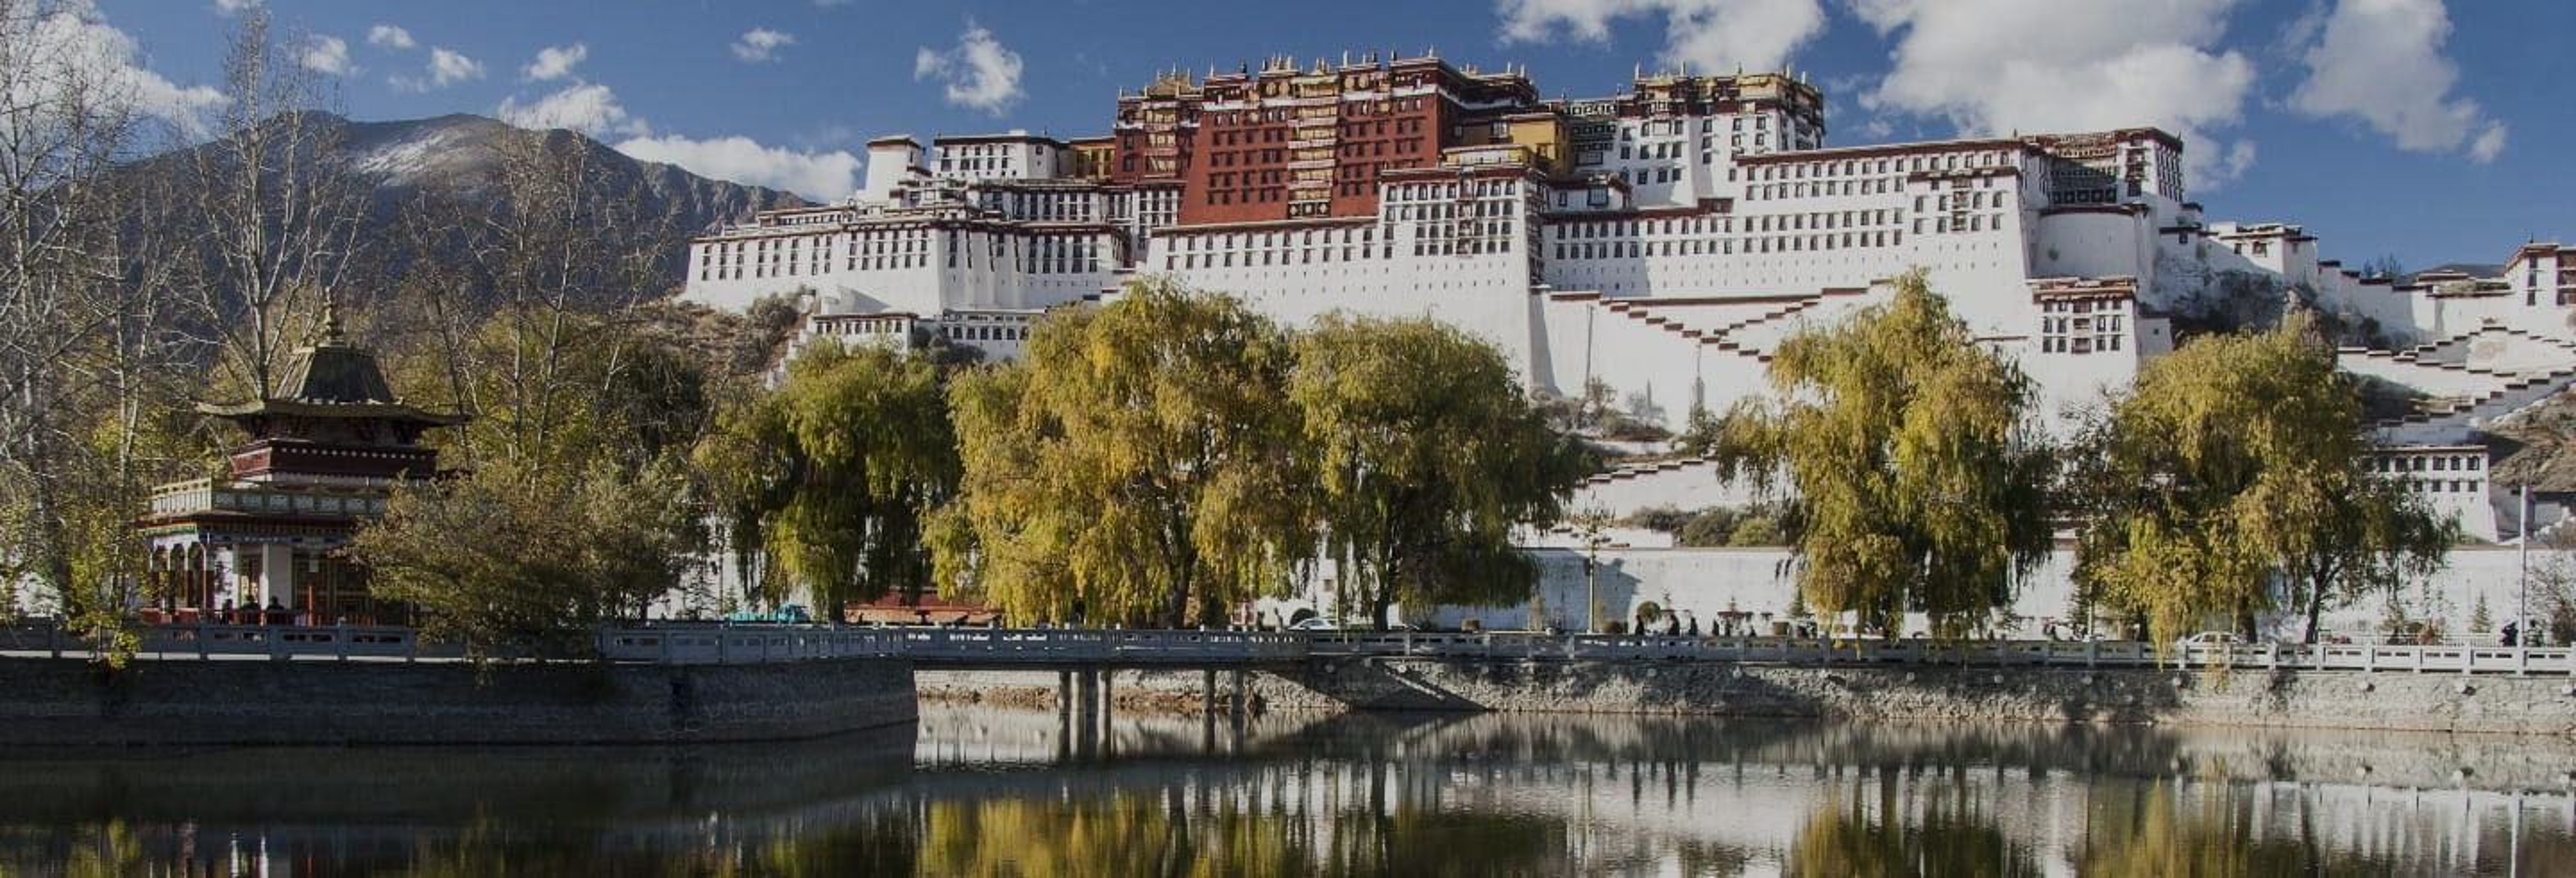 Visita guiada privada por Lhasa